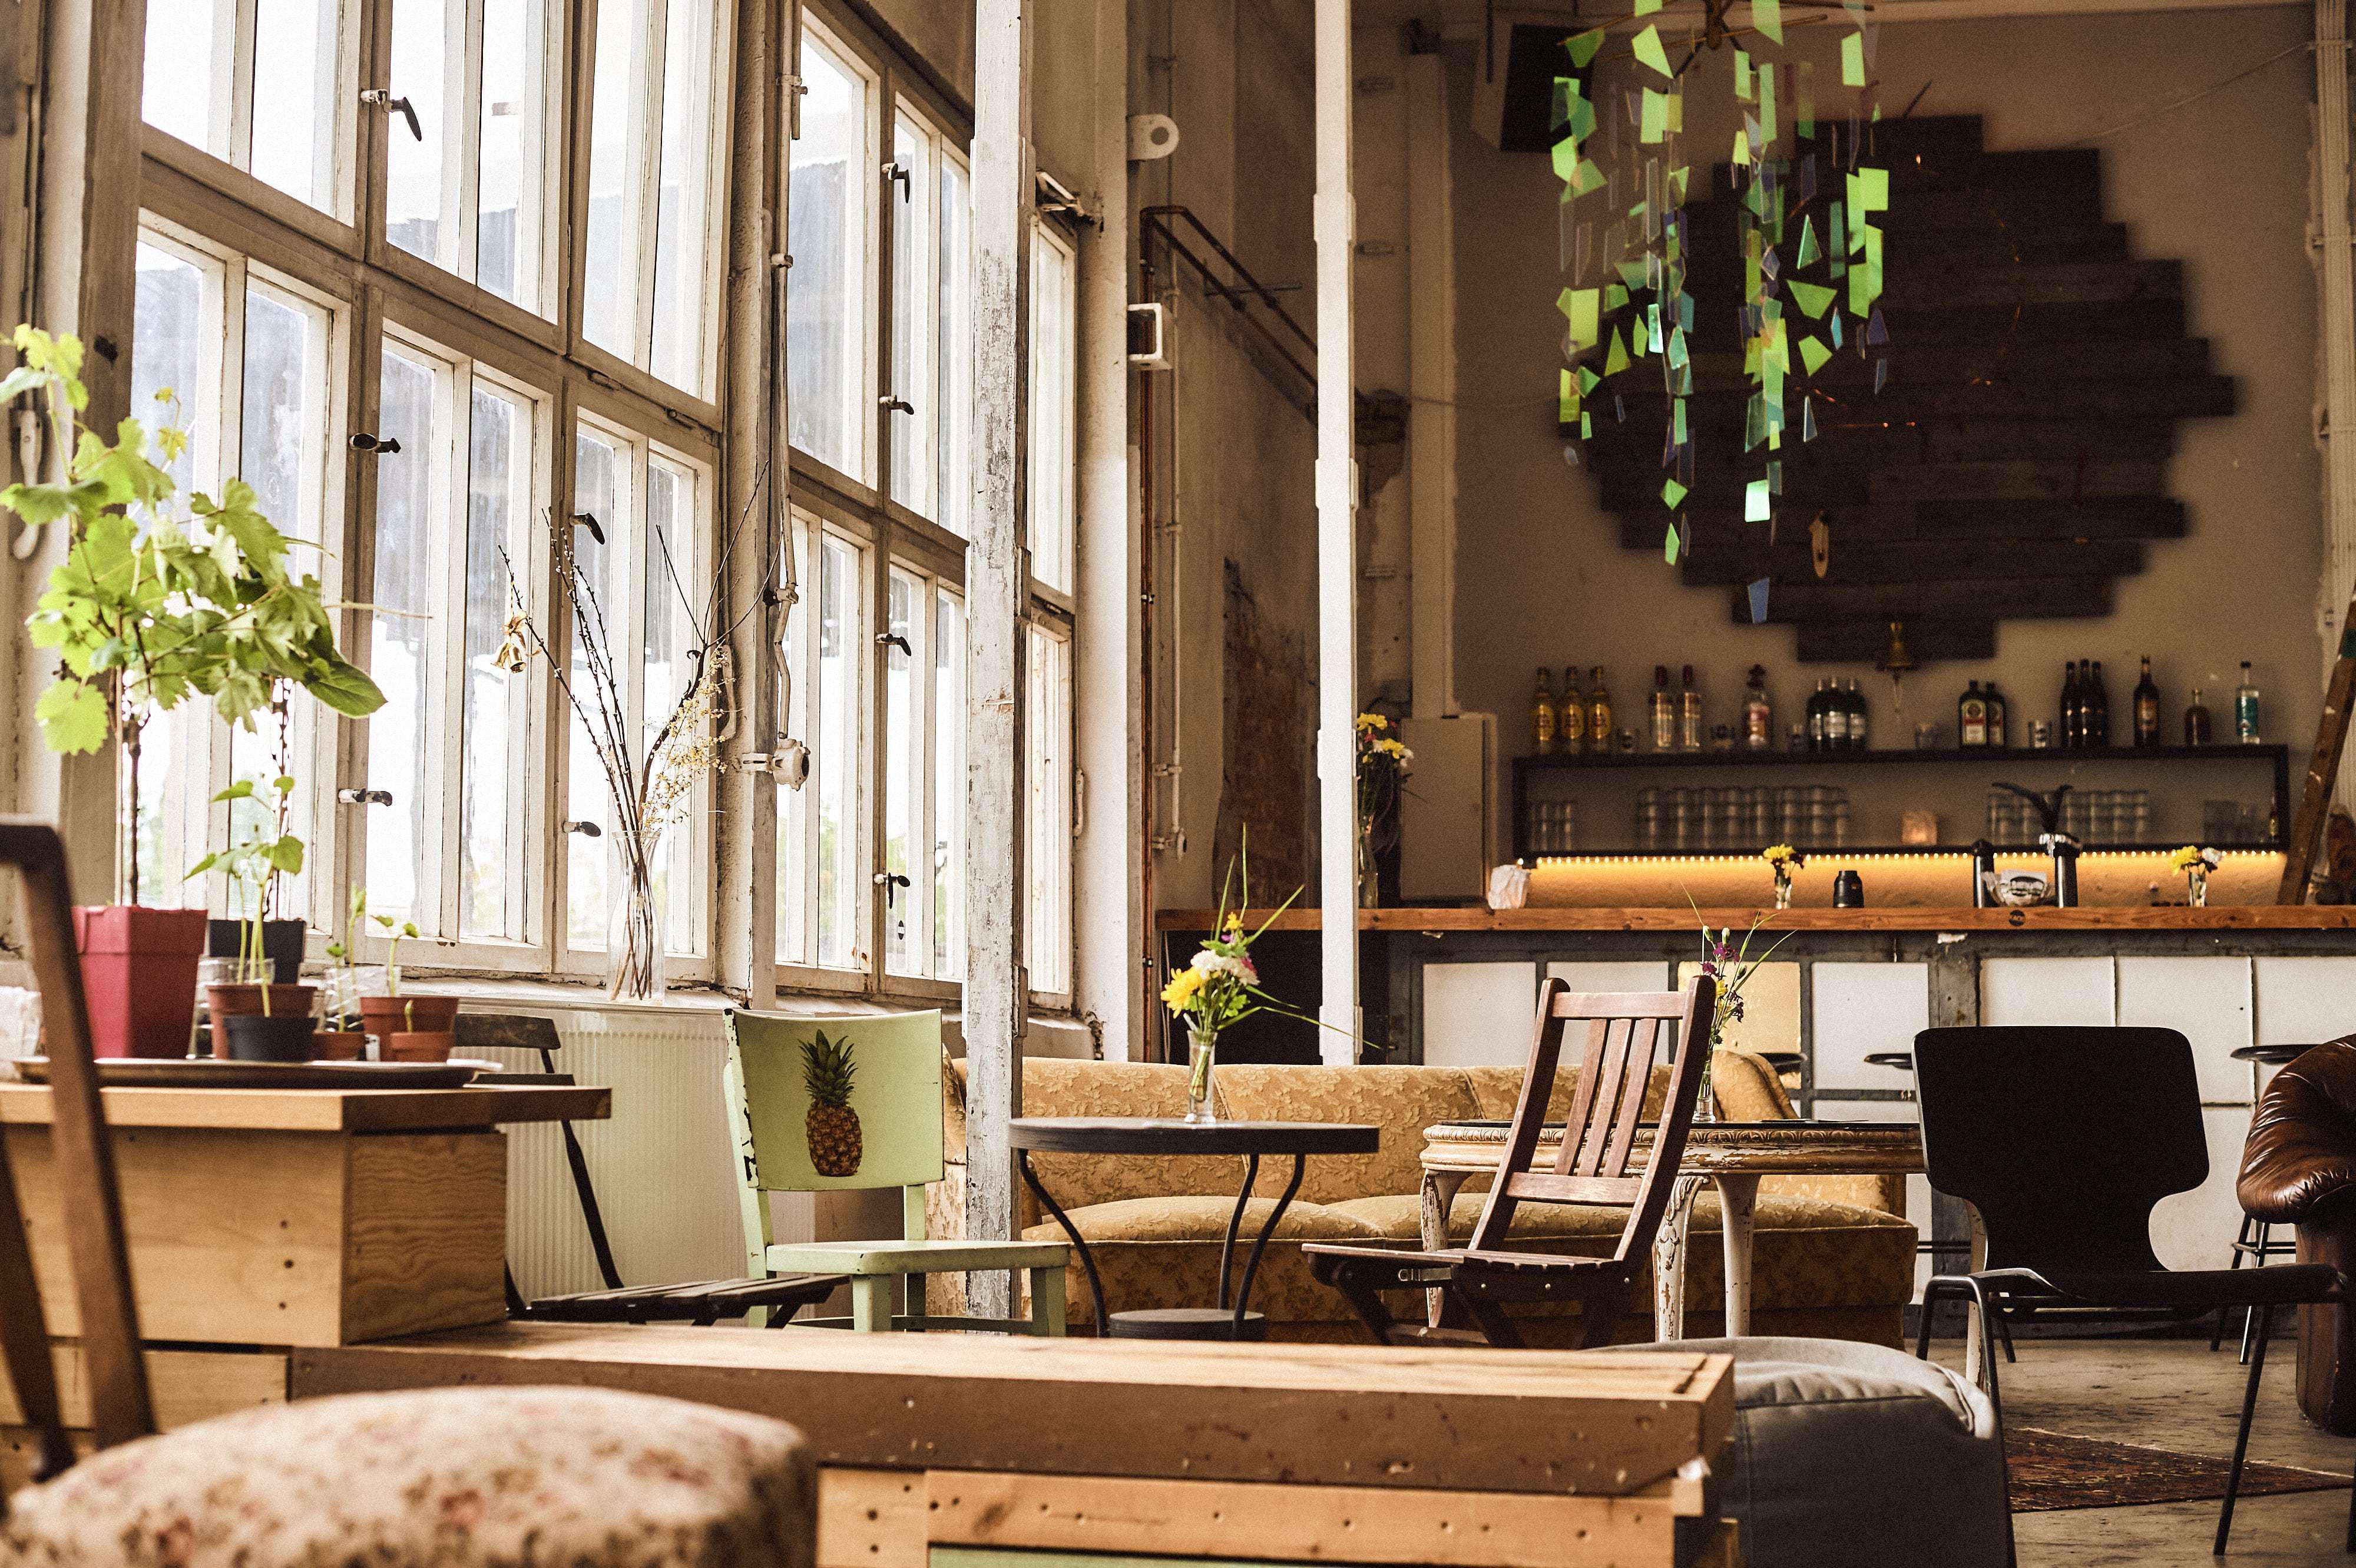 kaos eventlocation mieten in berlin. Black Bedroom Furniture Sets. Home Design Ideas